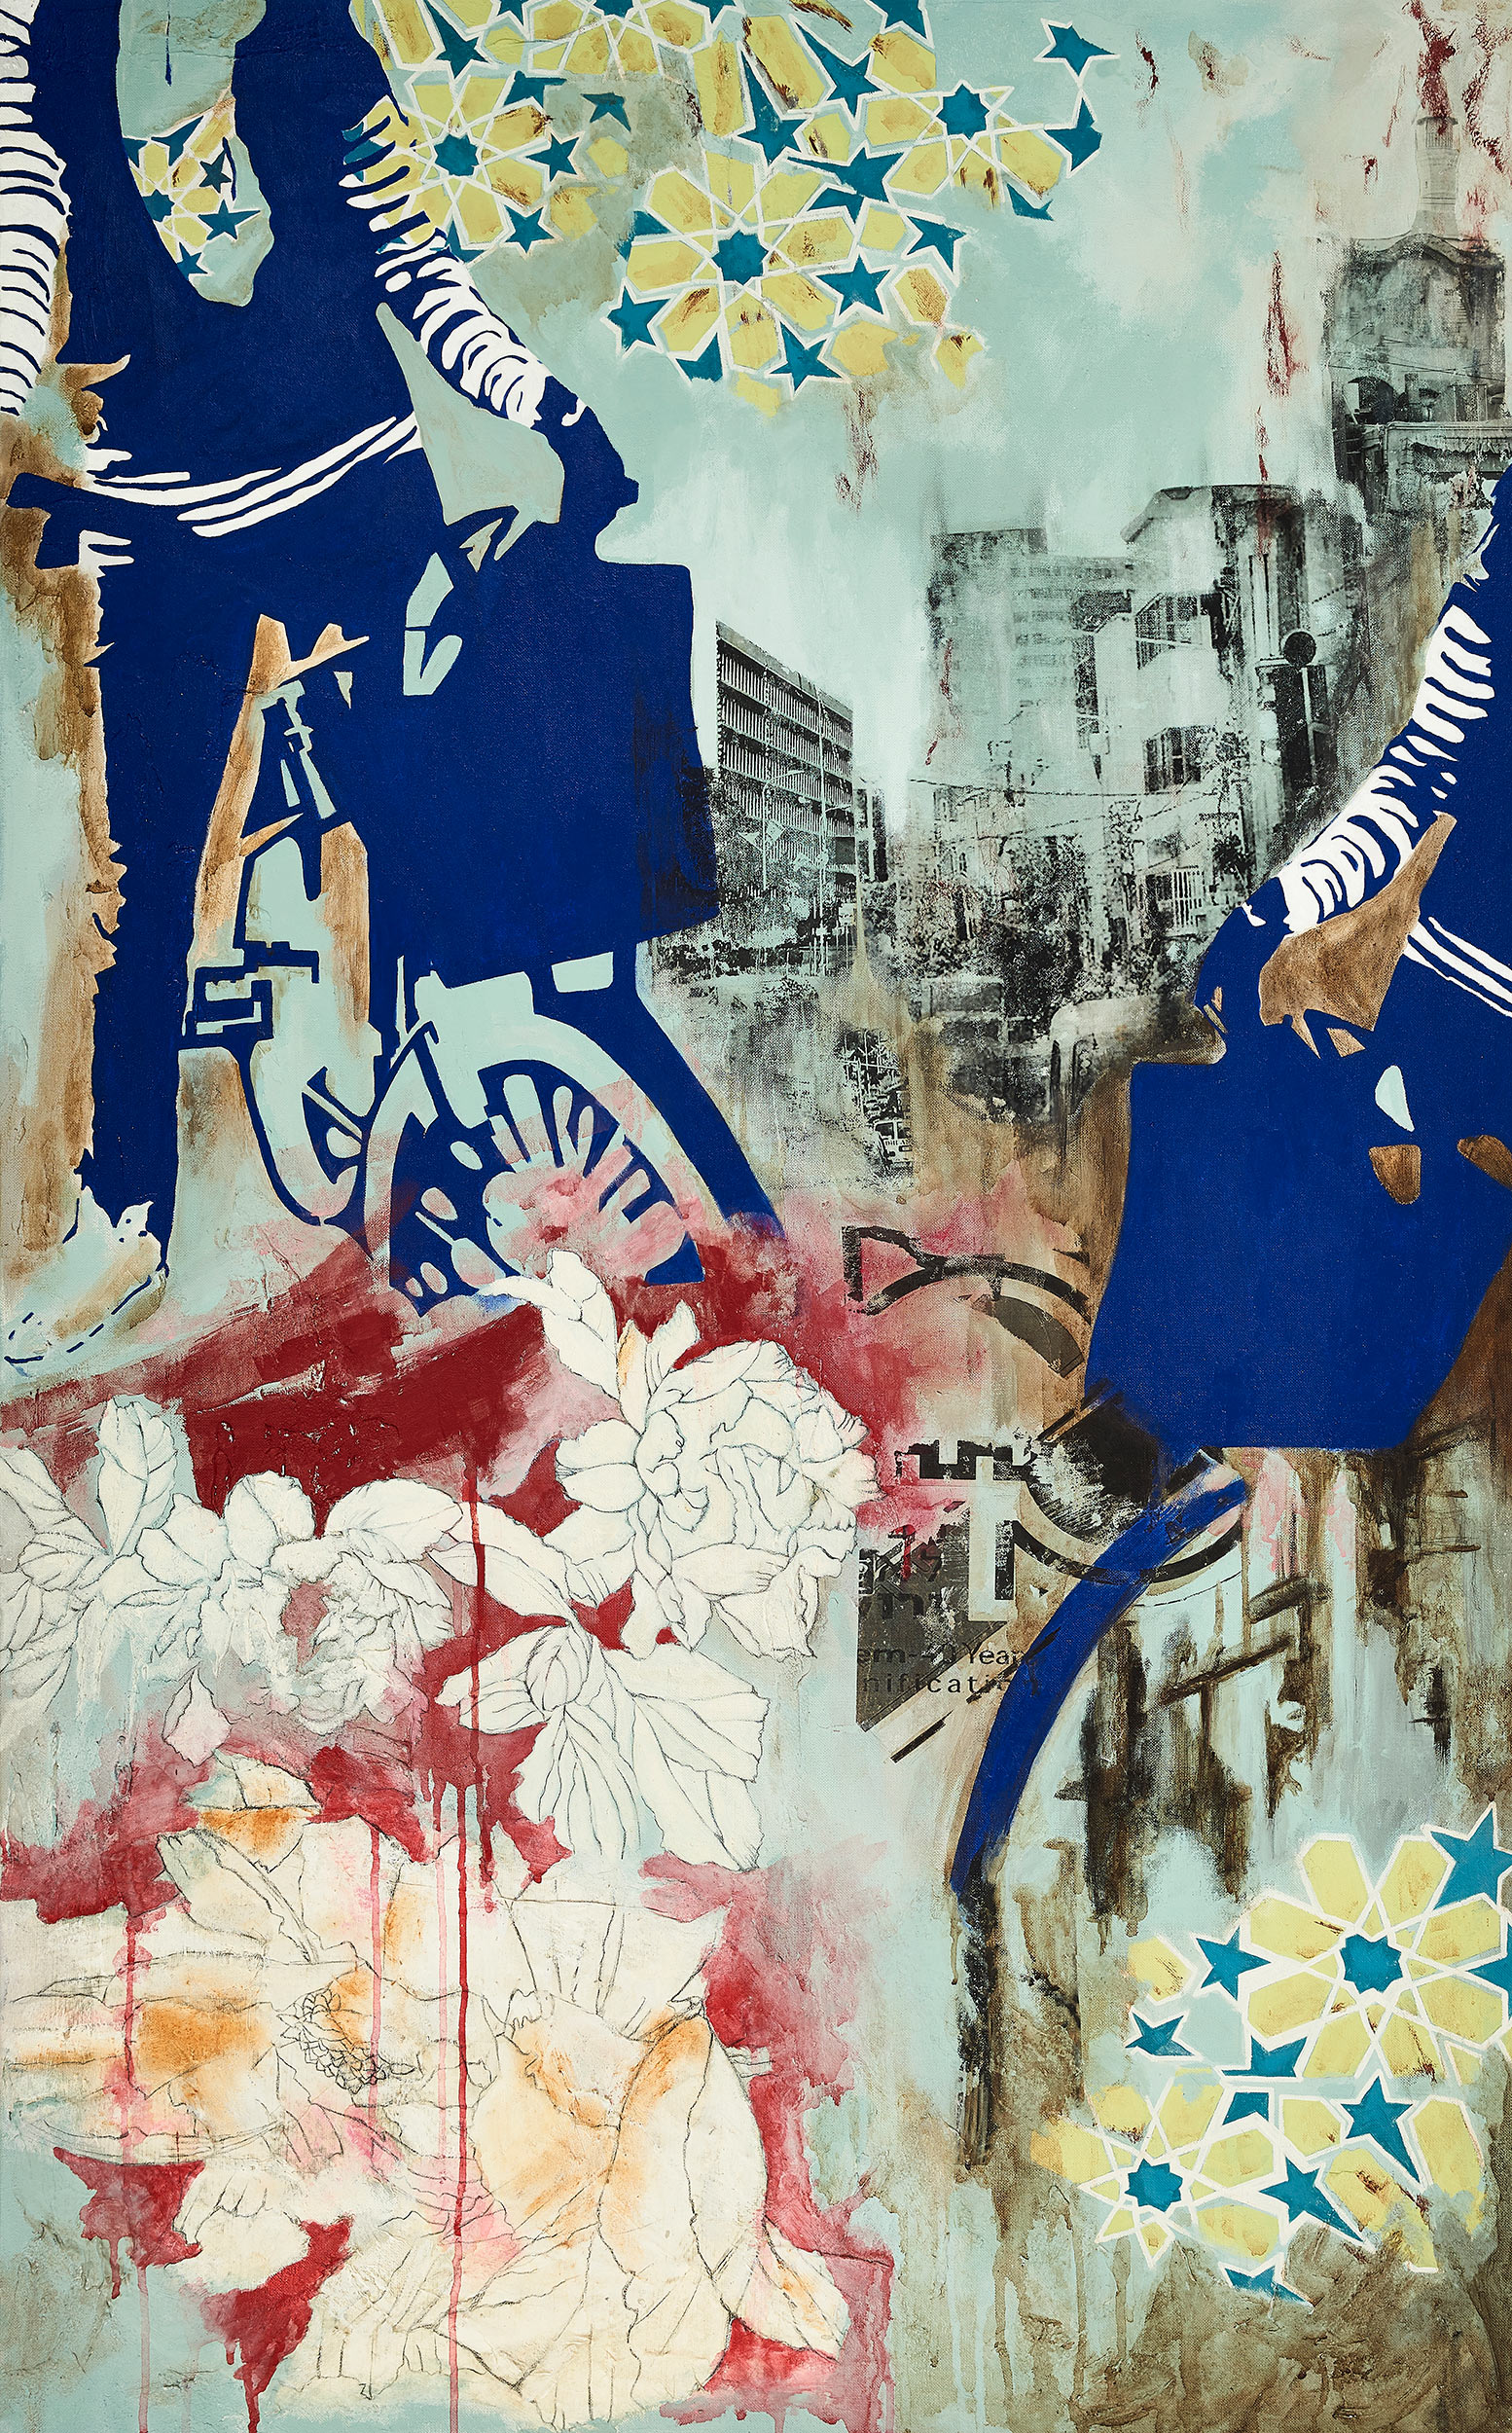 Spring in Tel Aviv  2014-15 Acrylic, mixed medium on canvas 130x90 cm